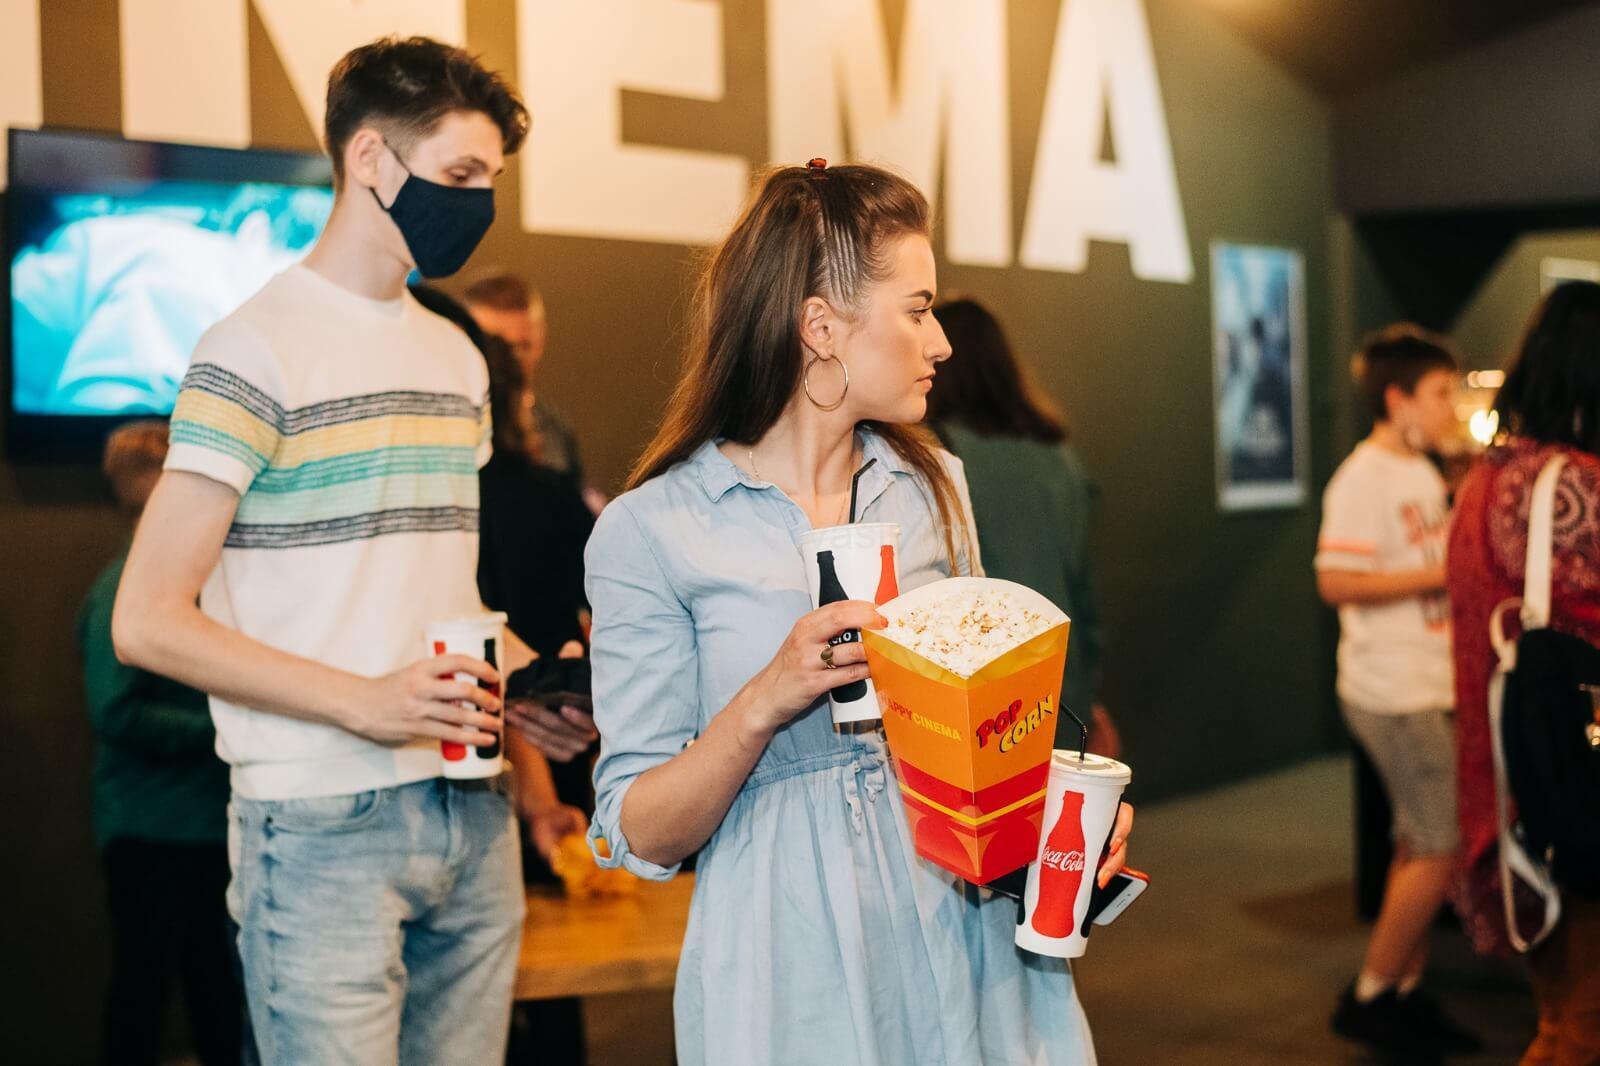 HAPPYCINEMA® deschide un nou cinematograf, în  Vaslui